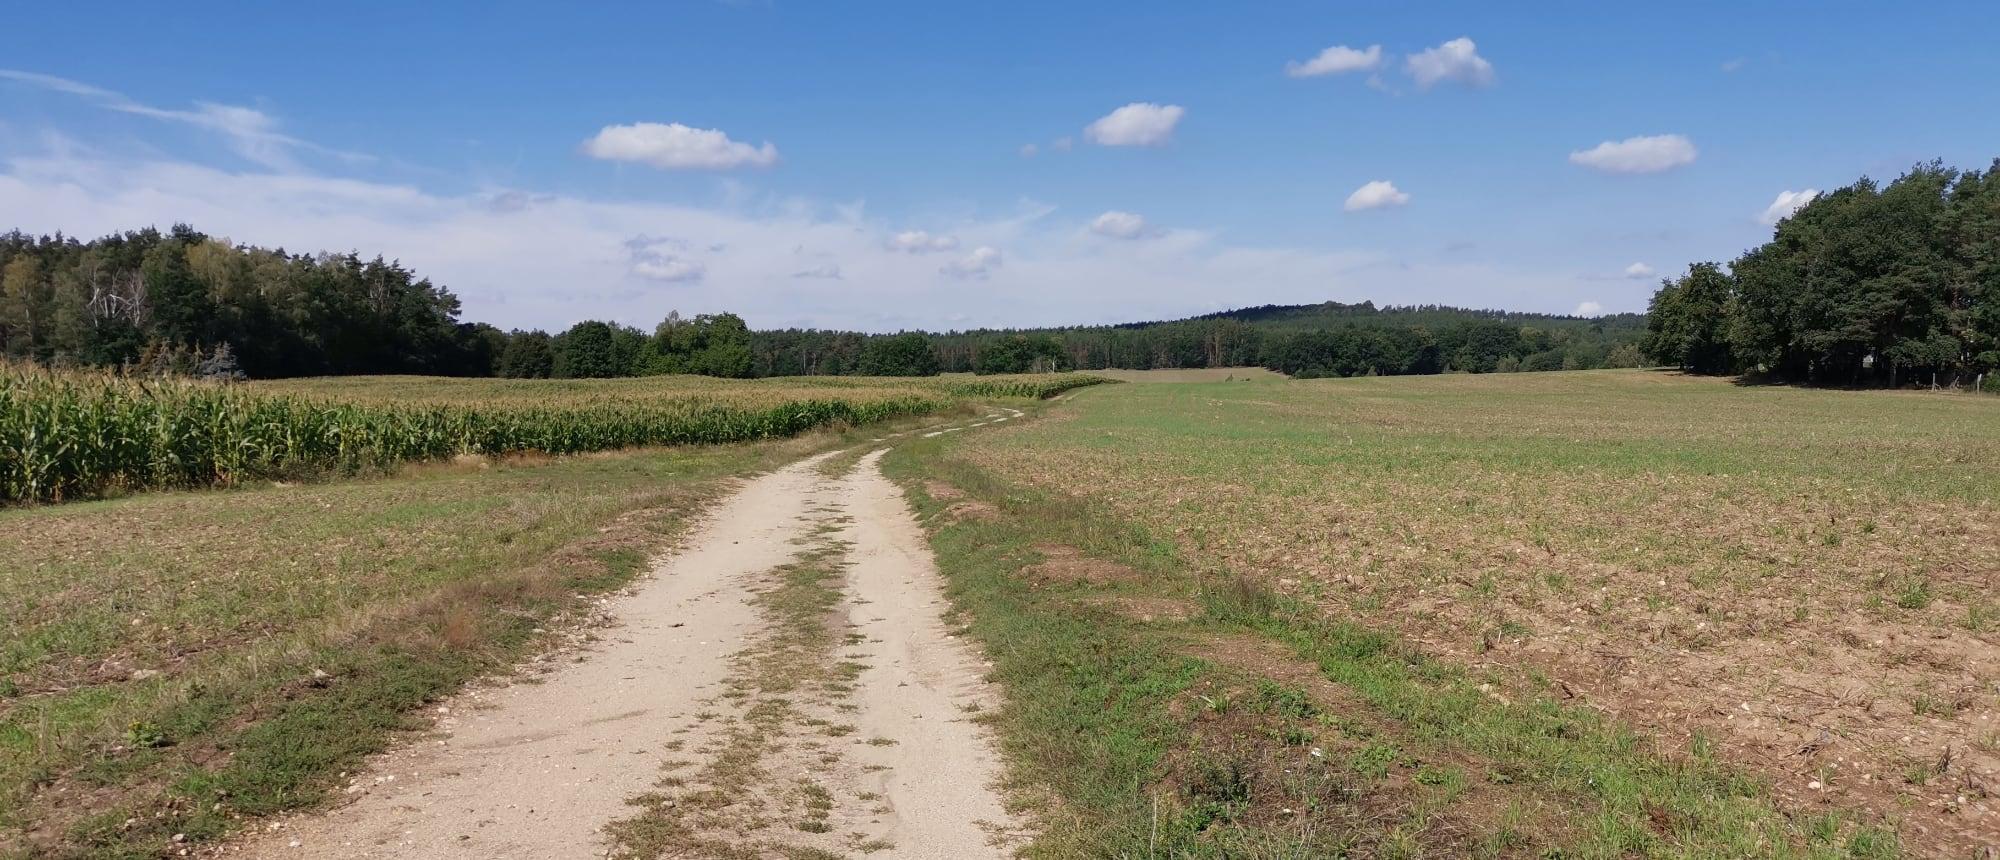 Ökumenischer Pilgerweg (Via Regia)